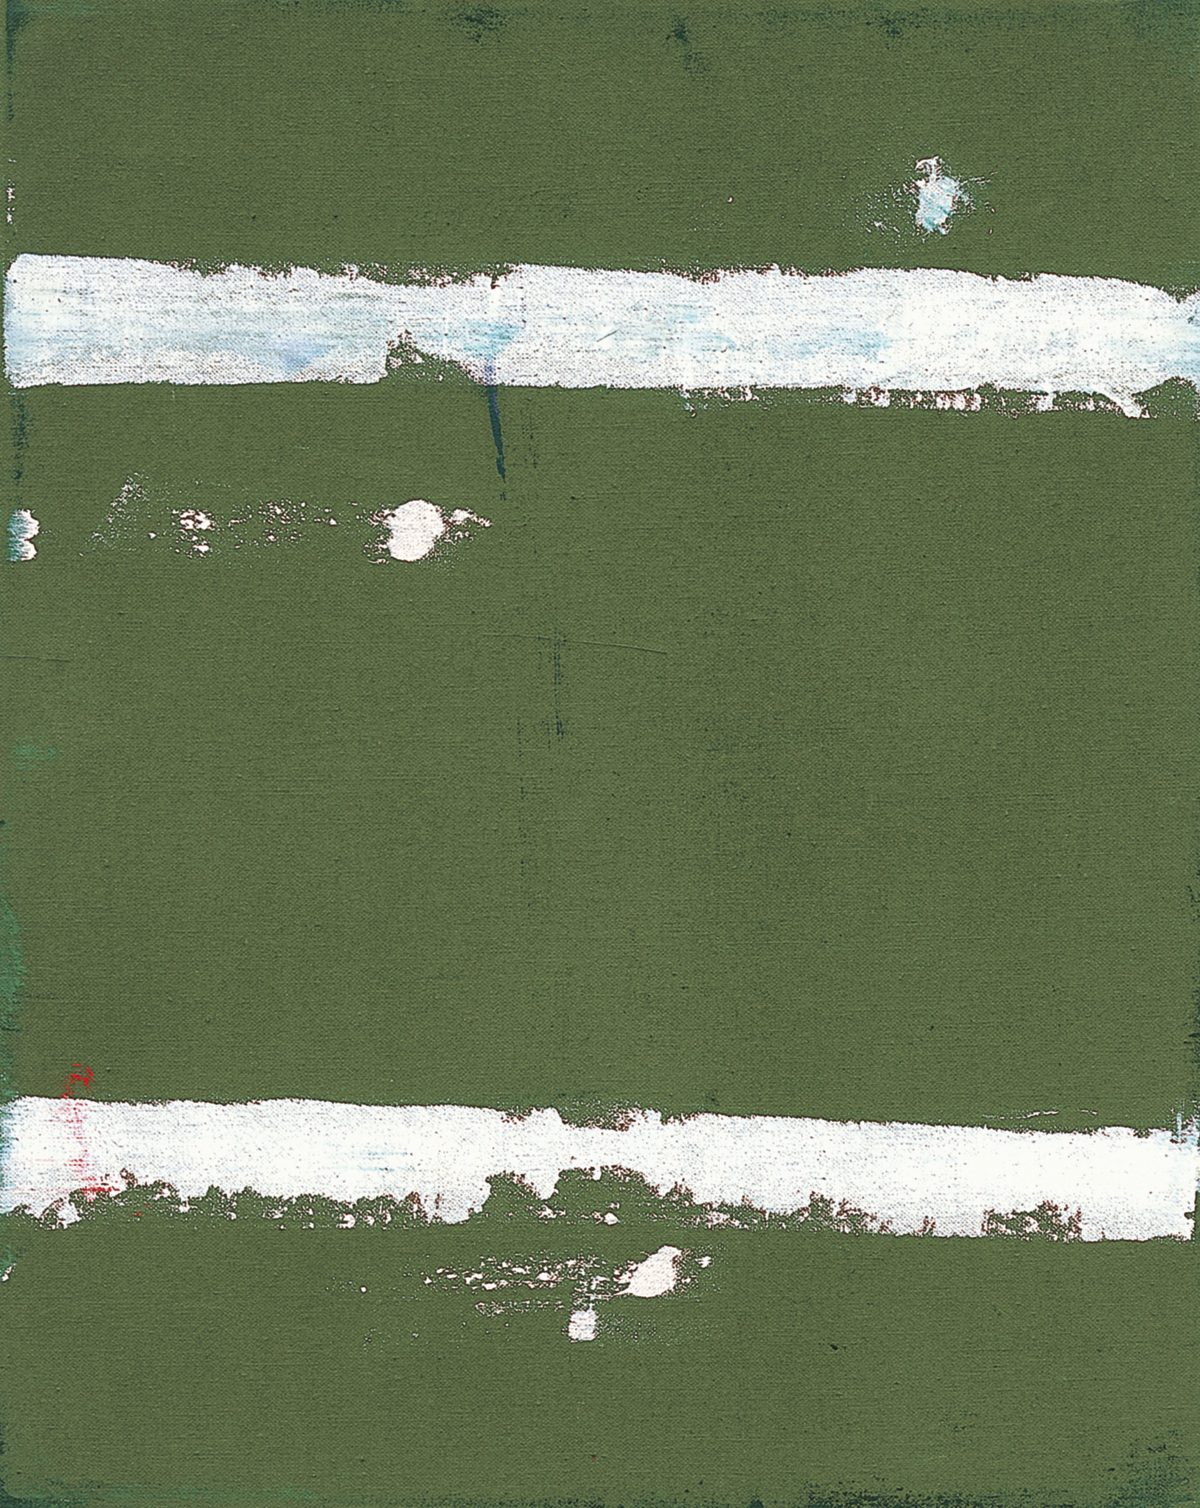 Raoul De Keyser, Hellepoort 7, 1985, Öl auf Leinwand, 50 x 40 cm, S.M.A.K. Stedelijk Museum voor Actuele Kunst, Gent © Familie Raoul De Keyser | SABAM Belgien 2018, Foto: Kristien Daem